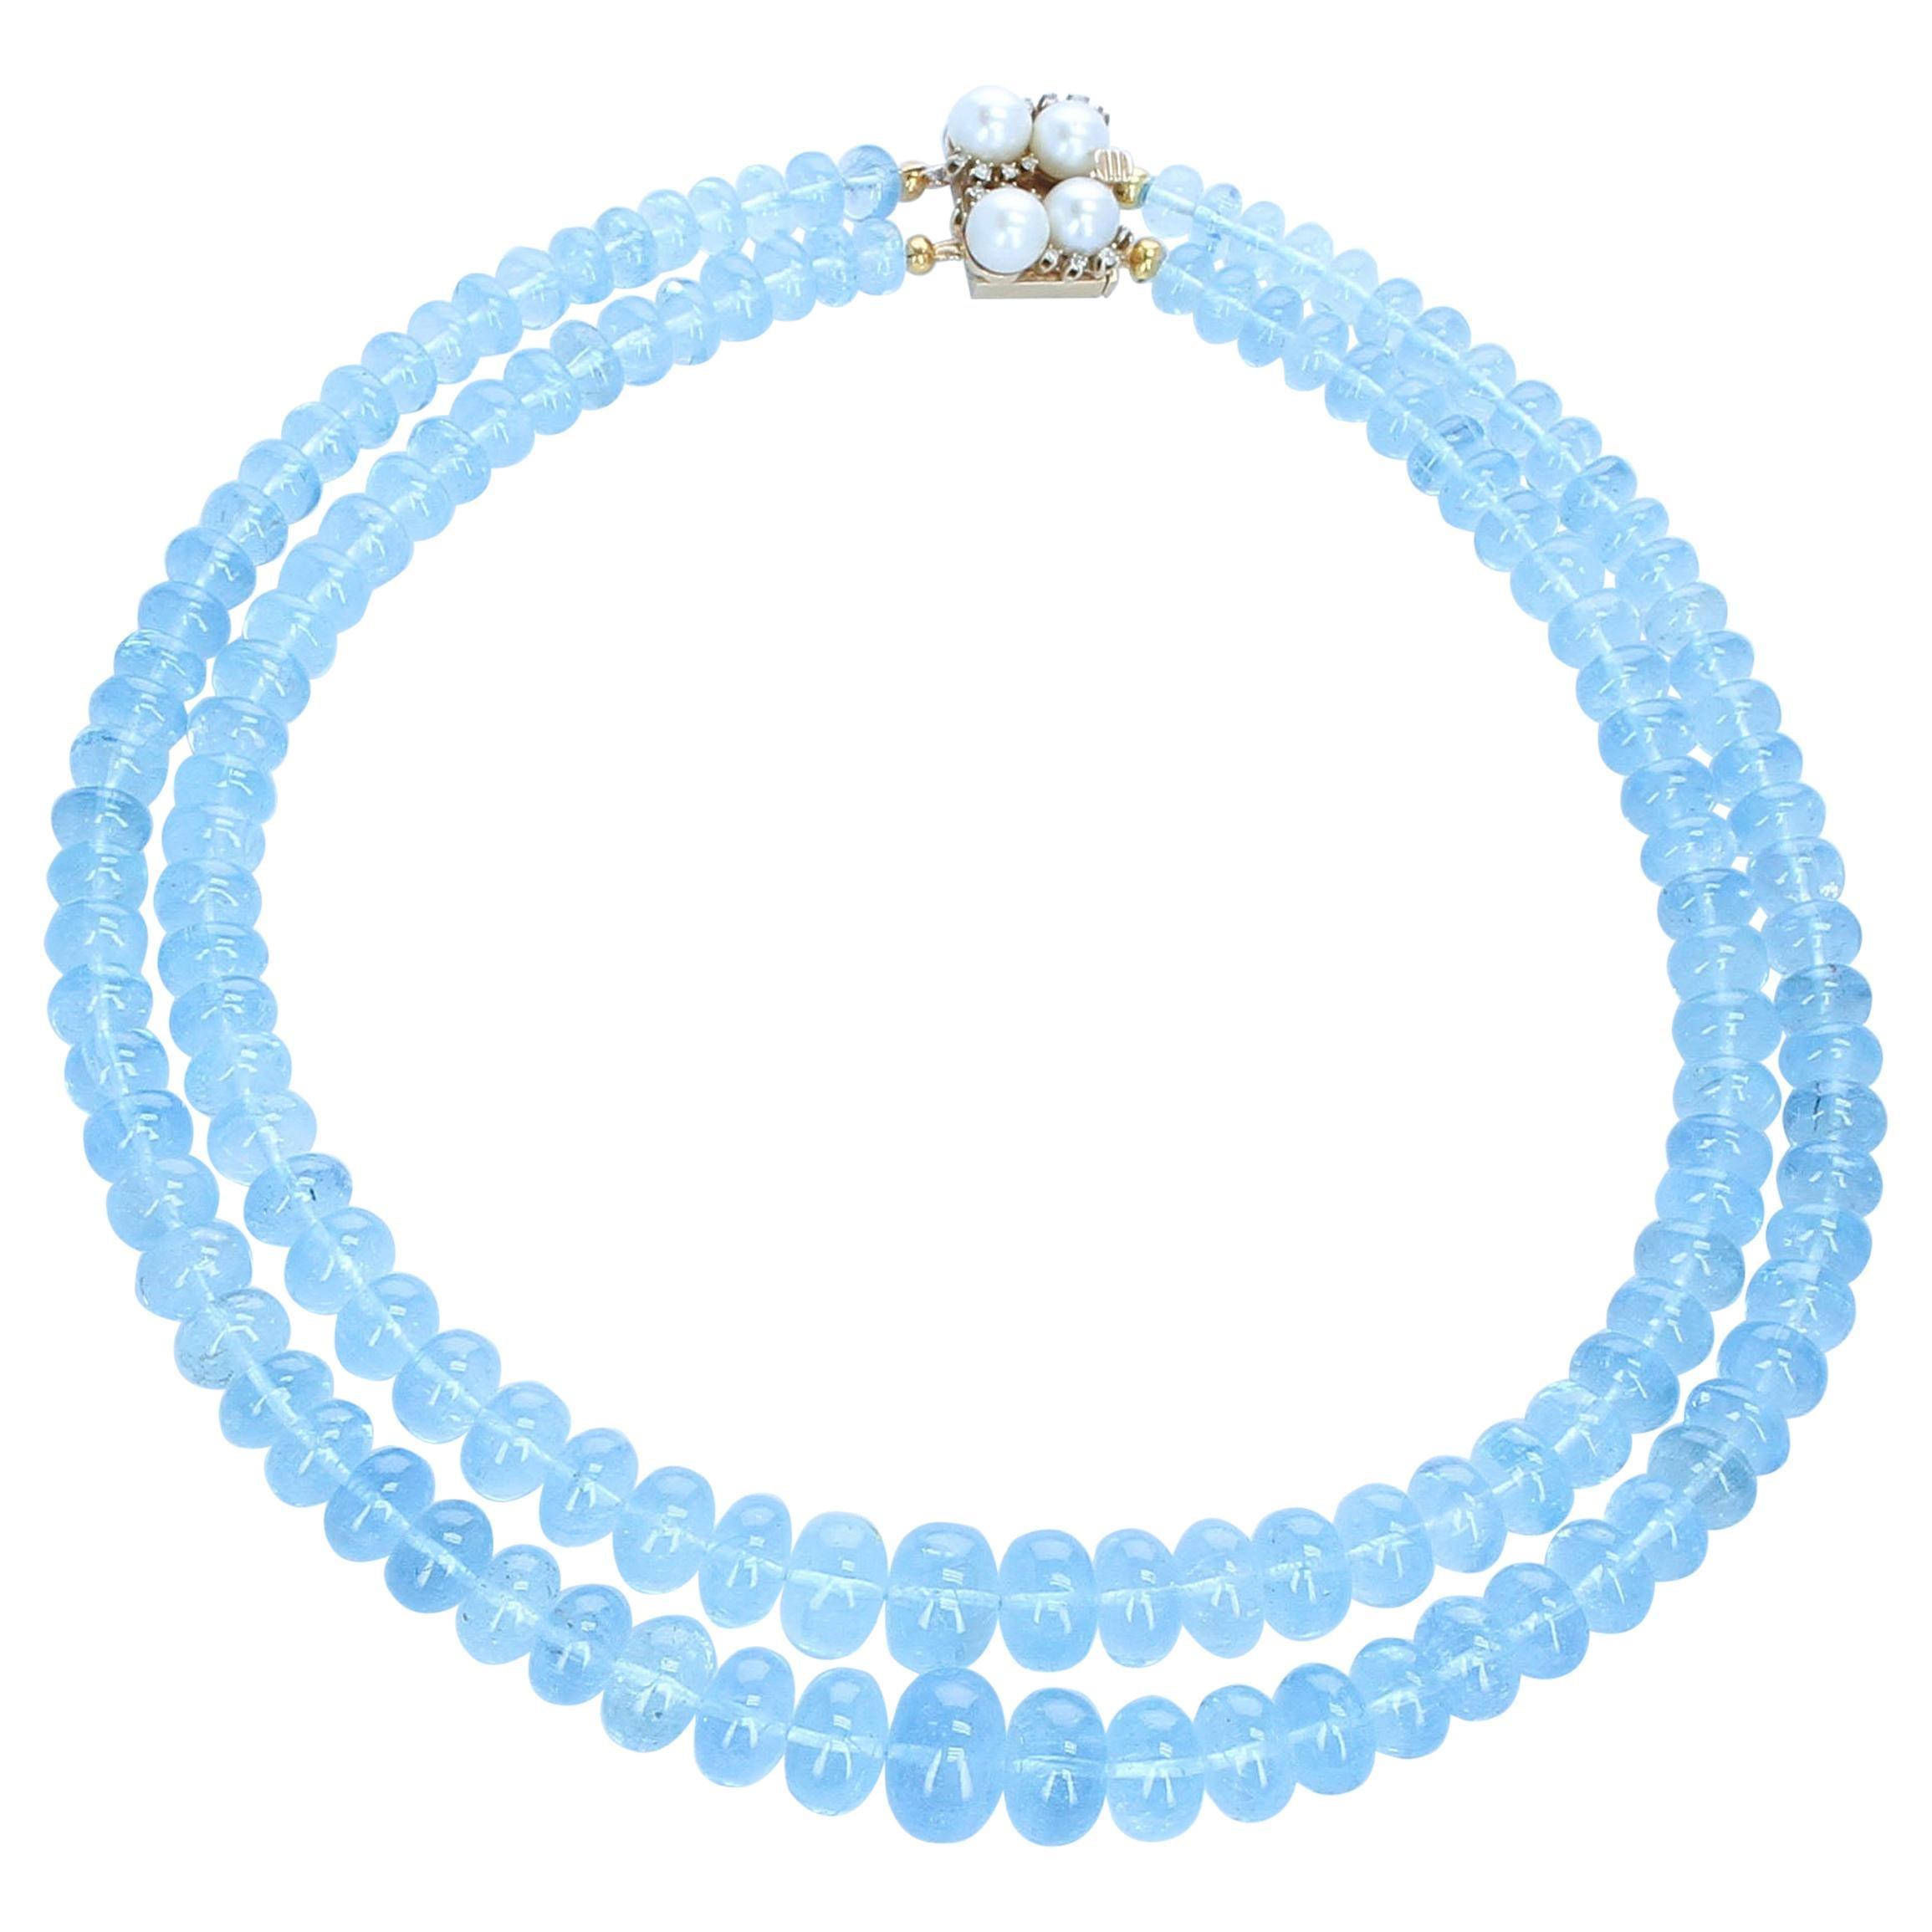 Large Aquamarine Smooth Beads with Pearl Clasp, 14 Karat